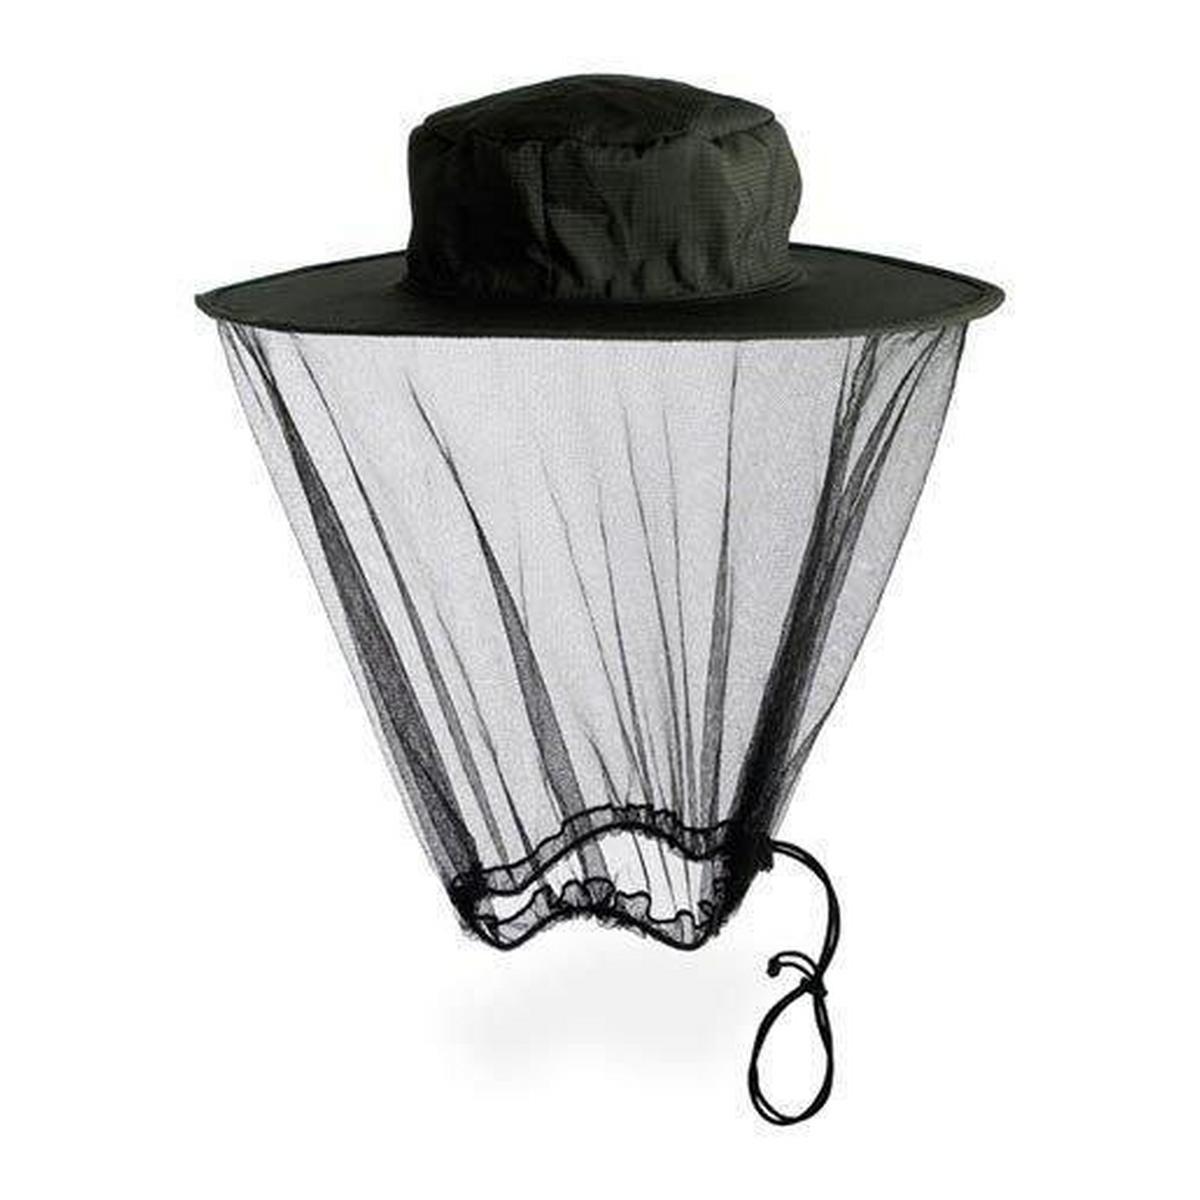 Lifesystems Midge Head Net Pop-Up Hat